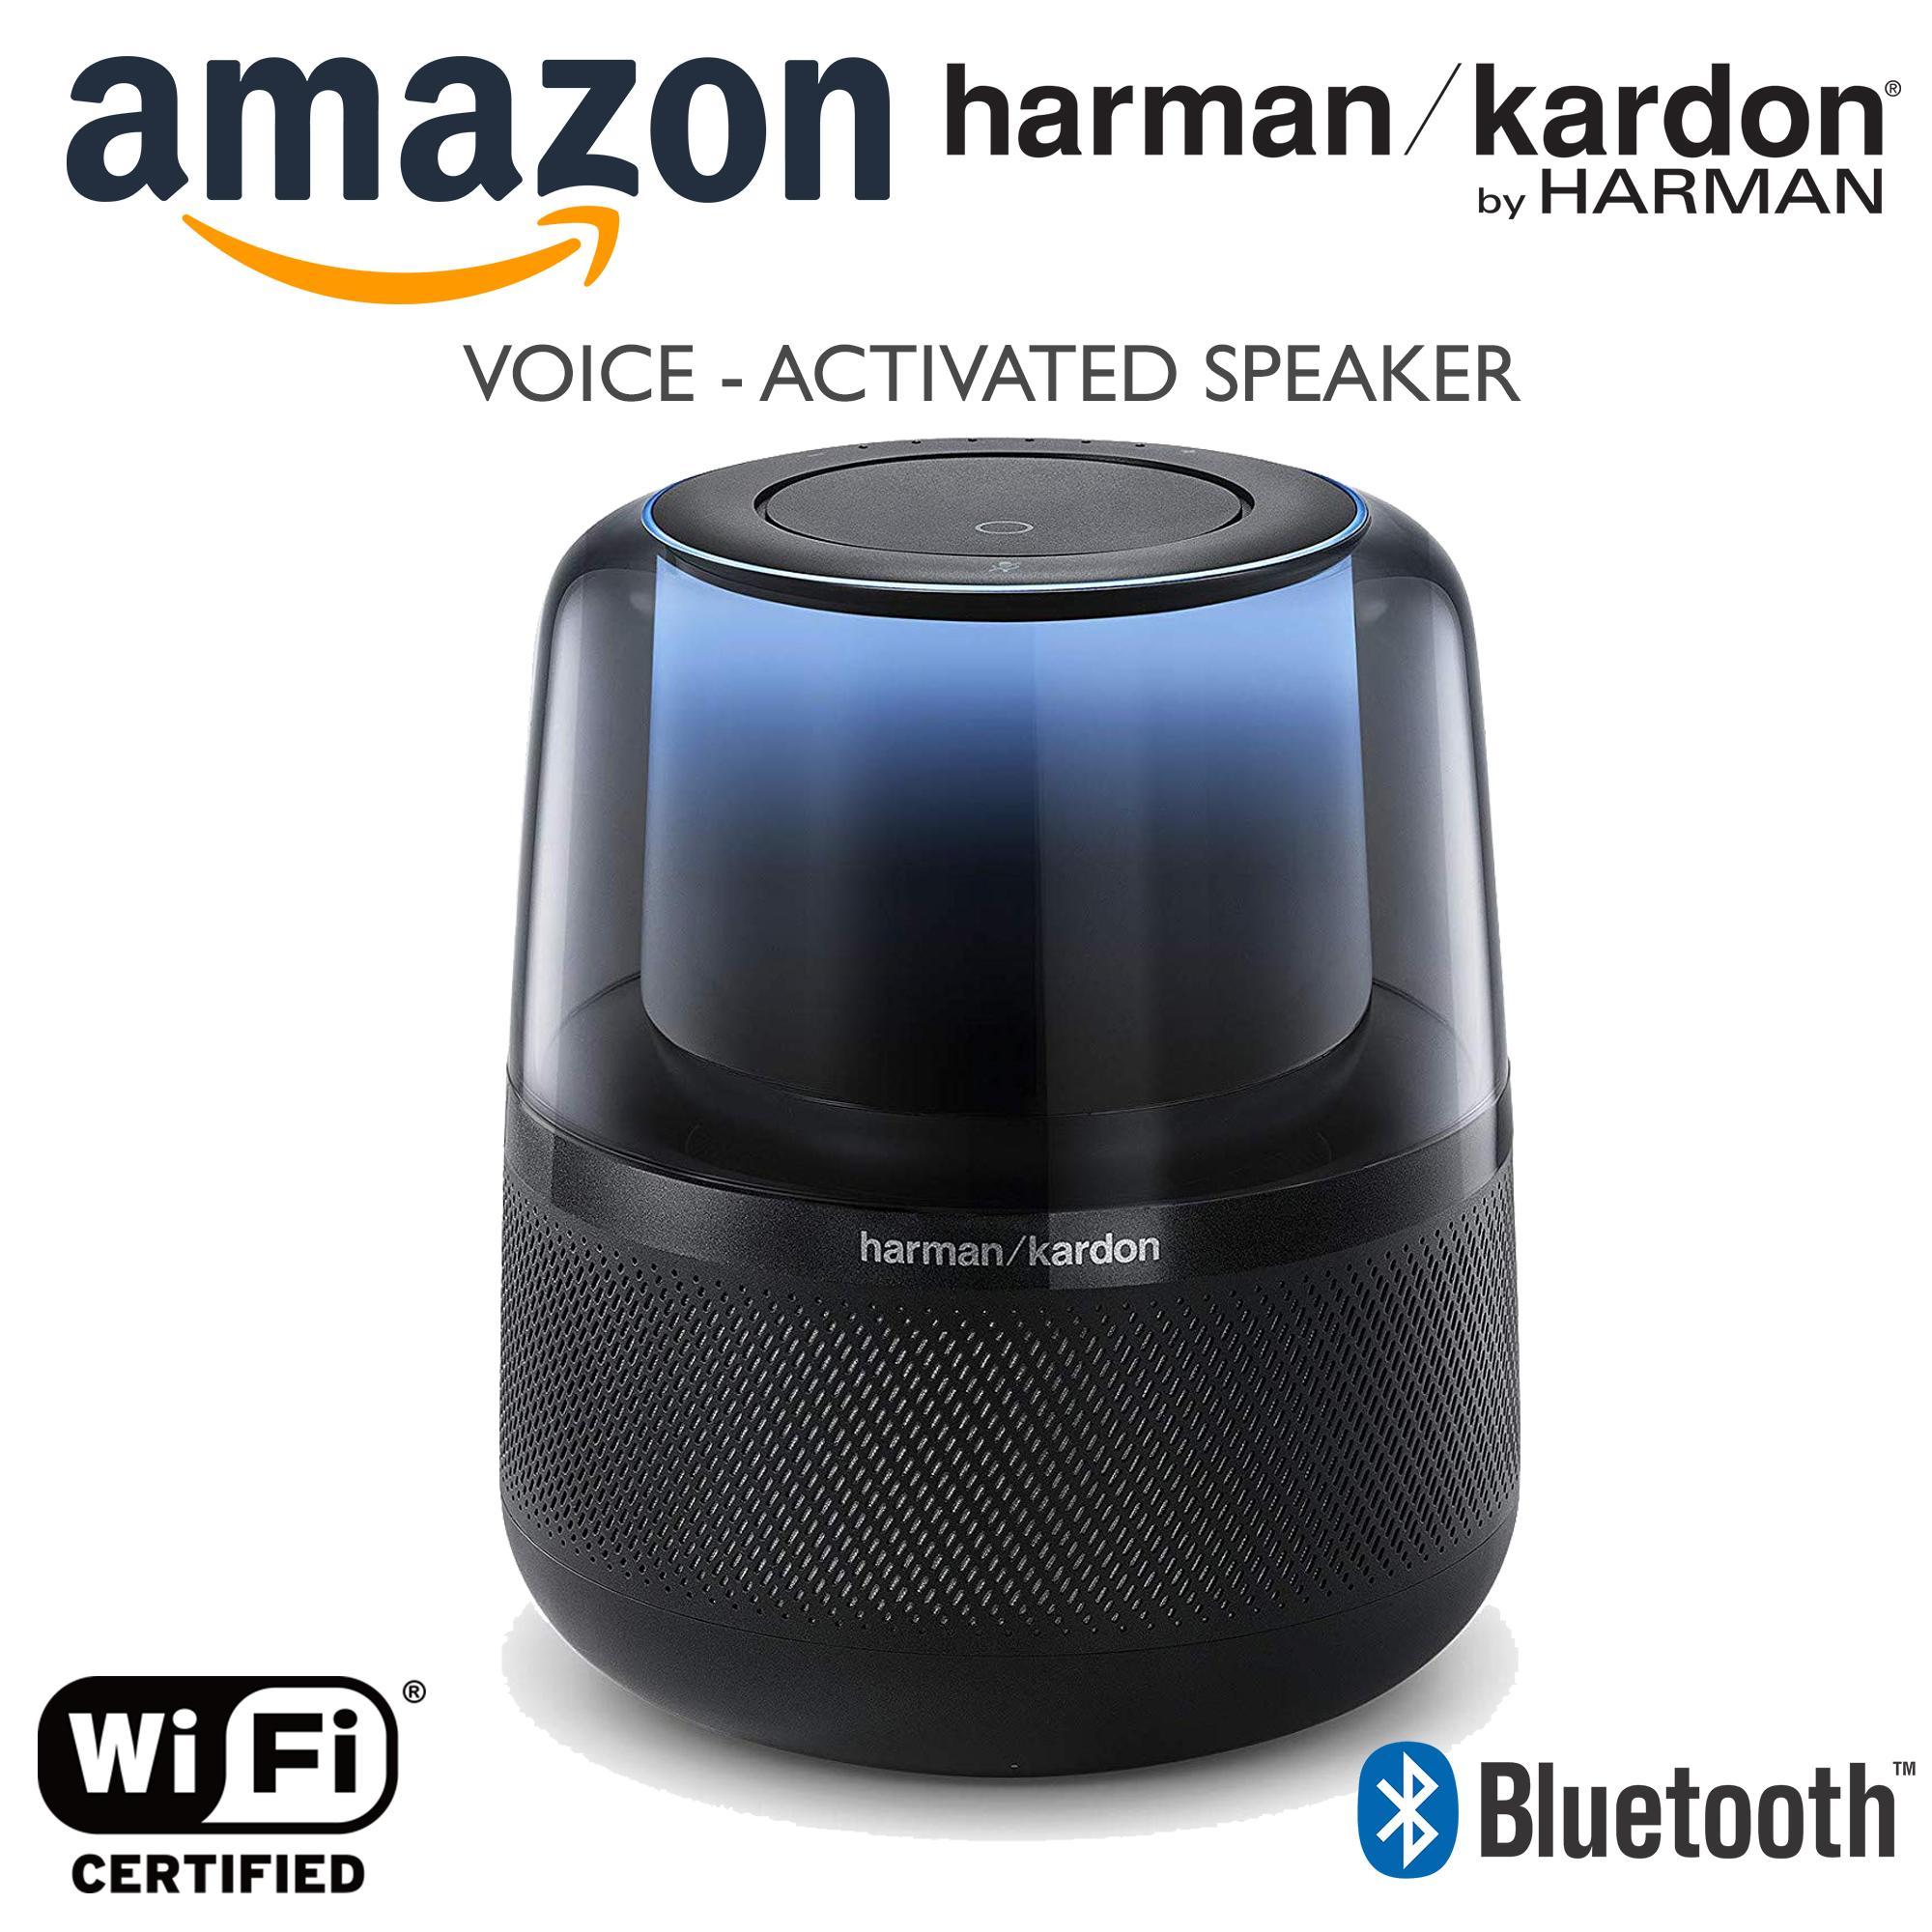 Amazon Allure Harman - Kardon Voice-Activated Home Speaker with Alexa Black  Wifi/Bluetooth Ready